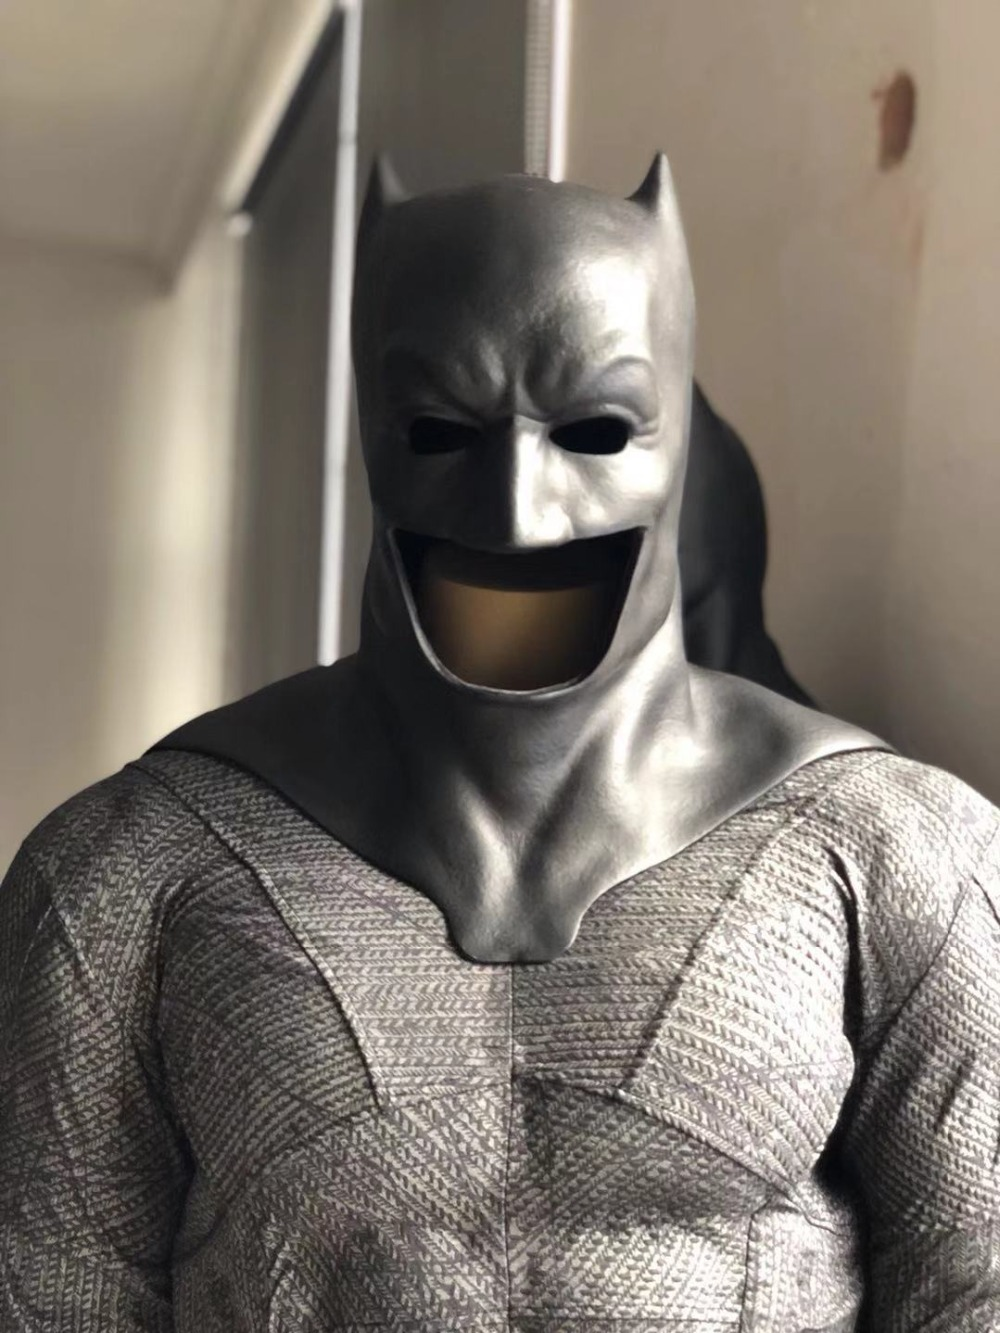 Batman Cowl From Dawn of Justice Batman v Superman and Justice League Batman Cosplay Mask Rubber Cast